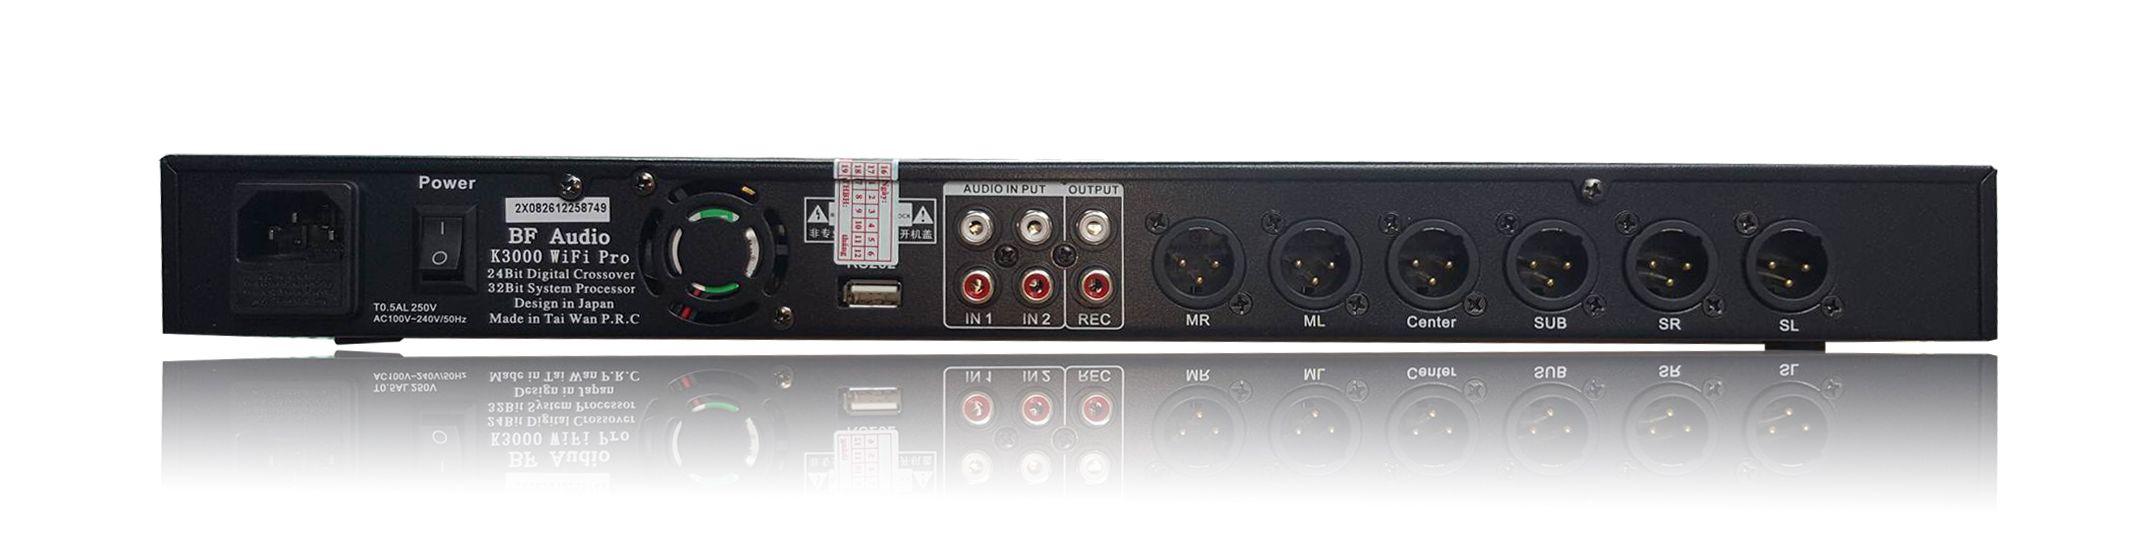 Mixer BFAUDIO K3000 WIFI PRO